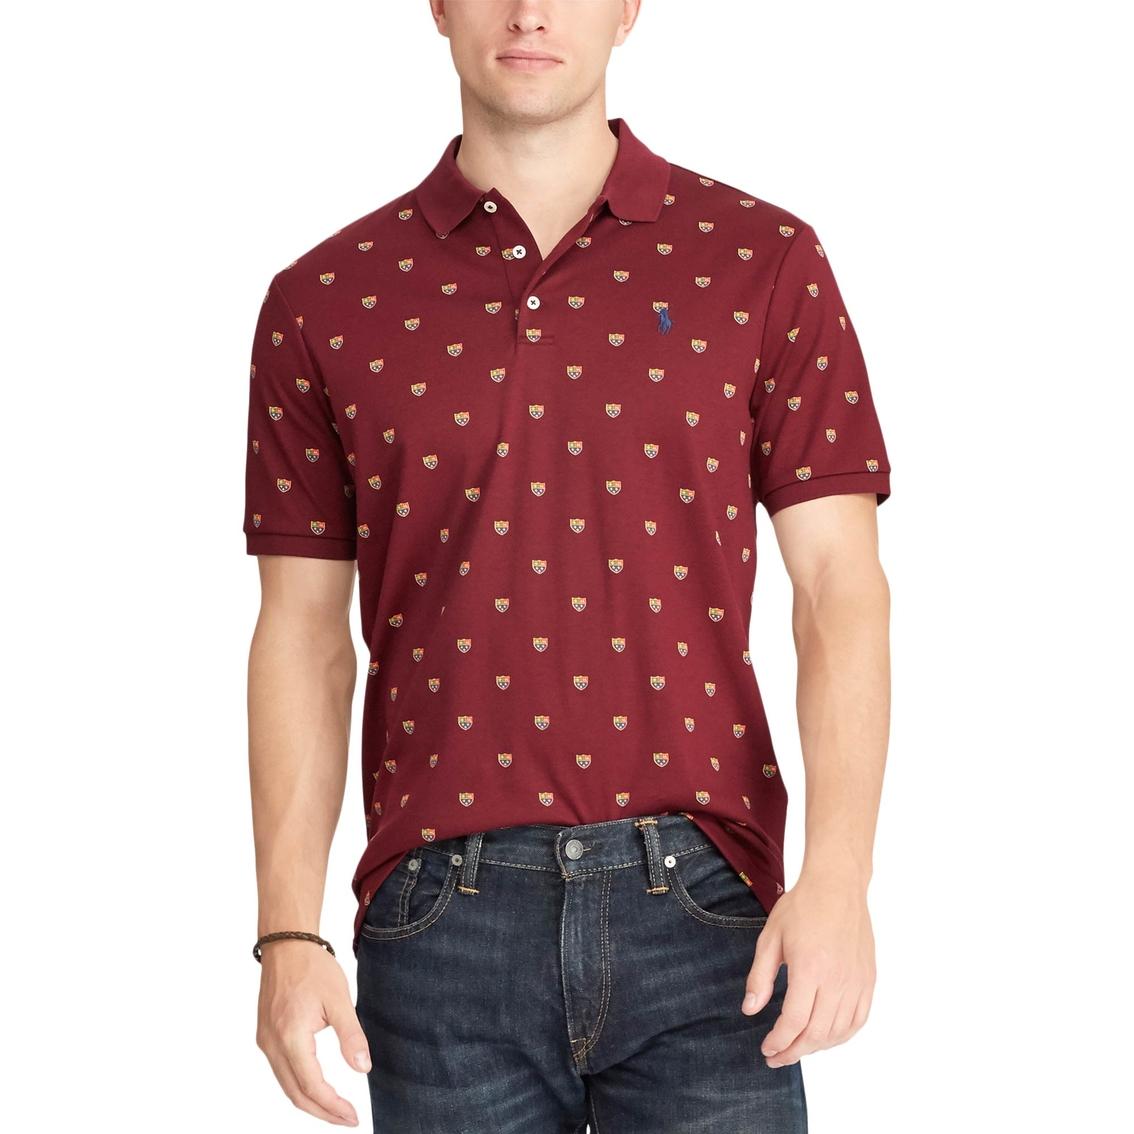 55089d8ca Polo Ralph Lauren Classic Fit Soft Touch Polo Shirt